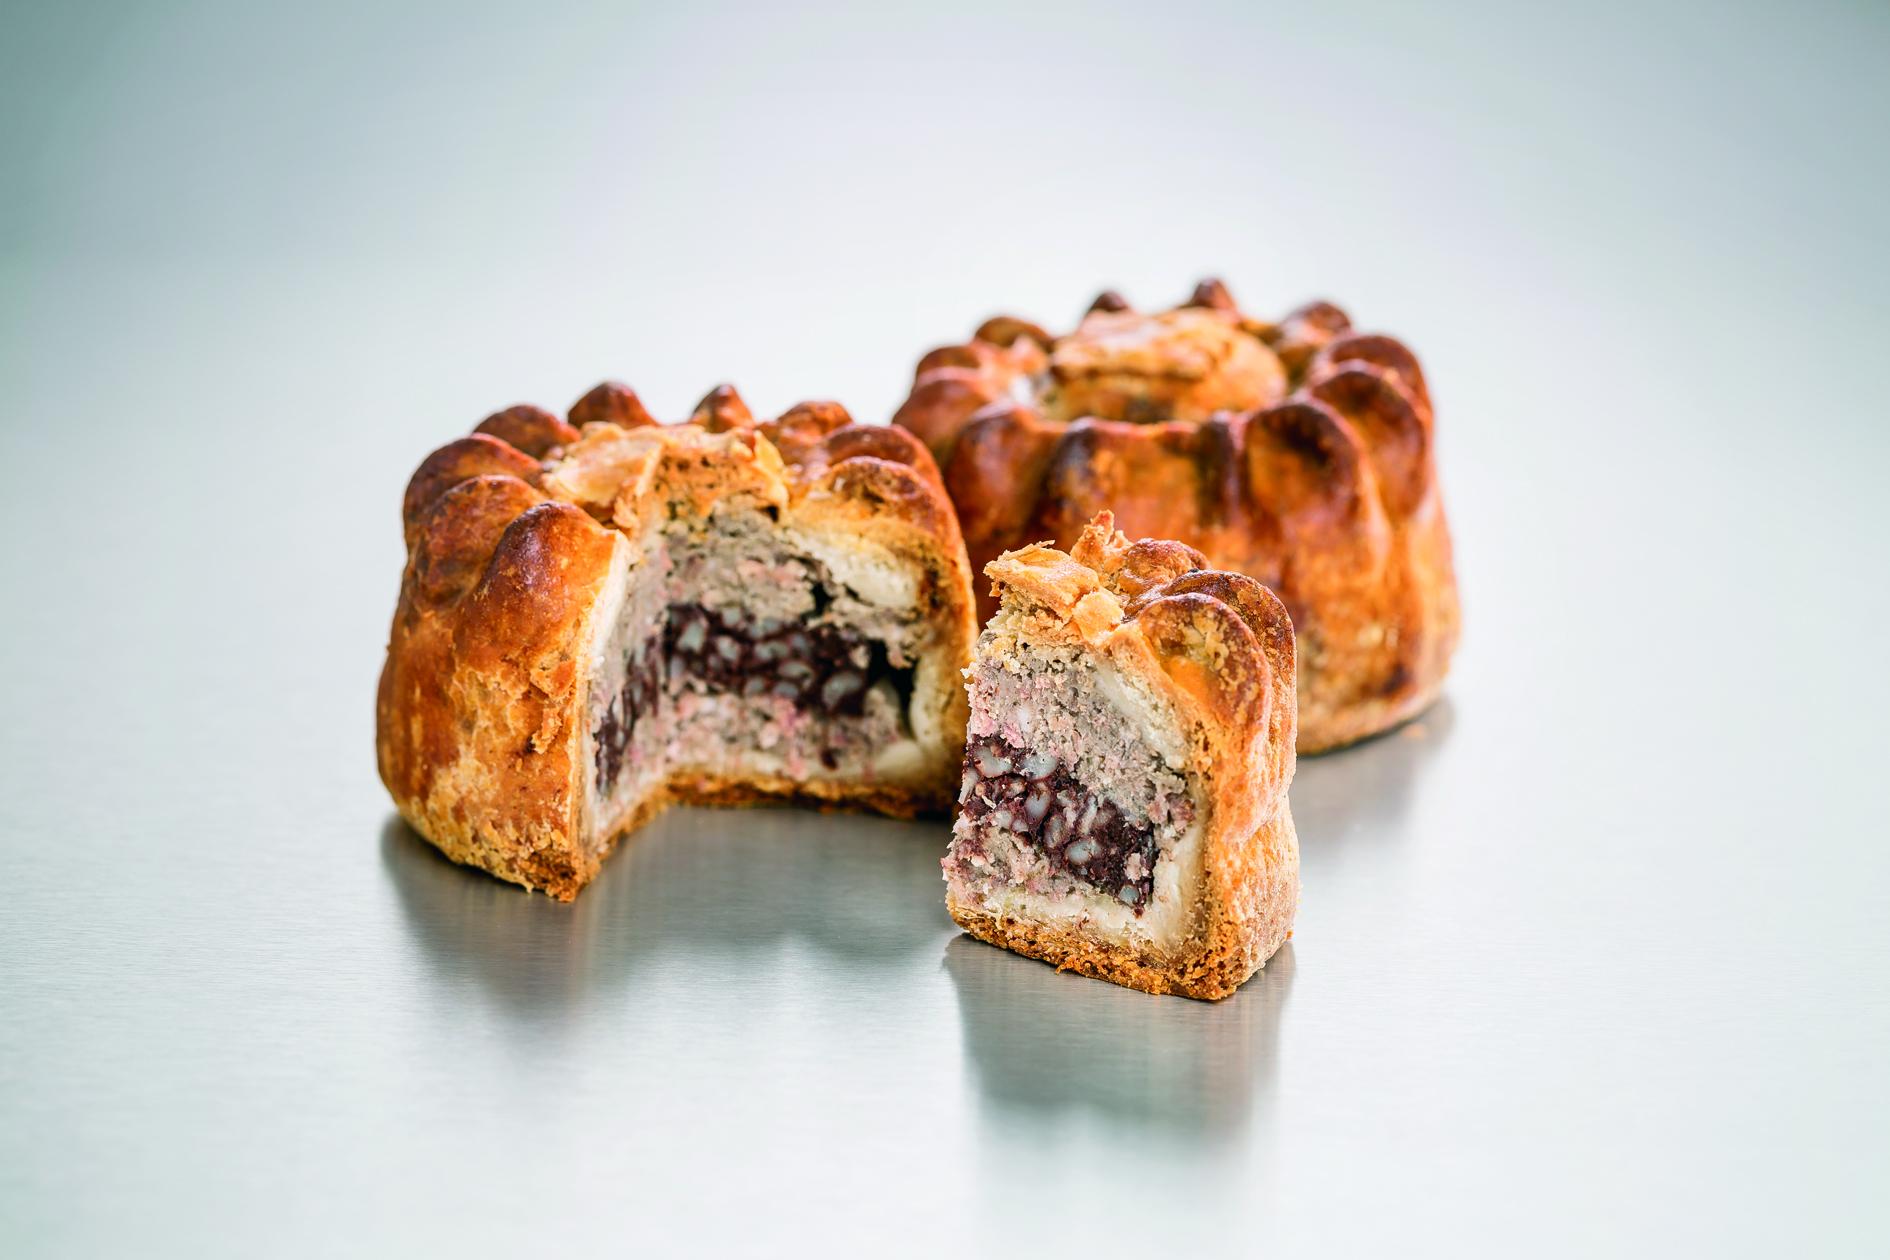 Pork & Black Pudding 1lb Pies ( Case of 10 )